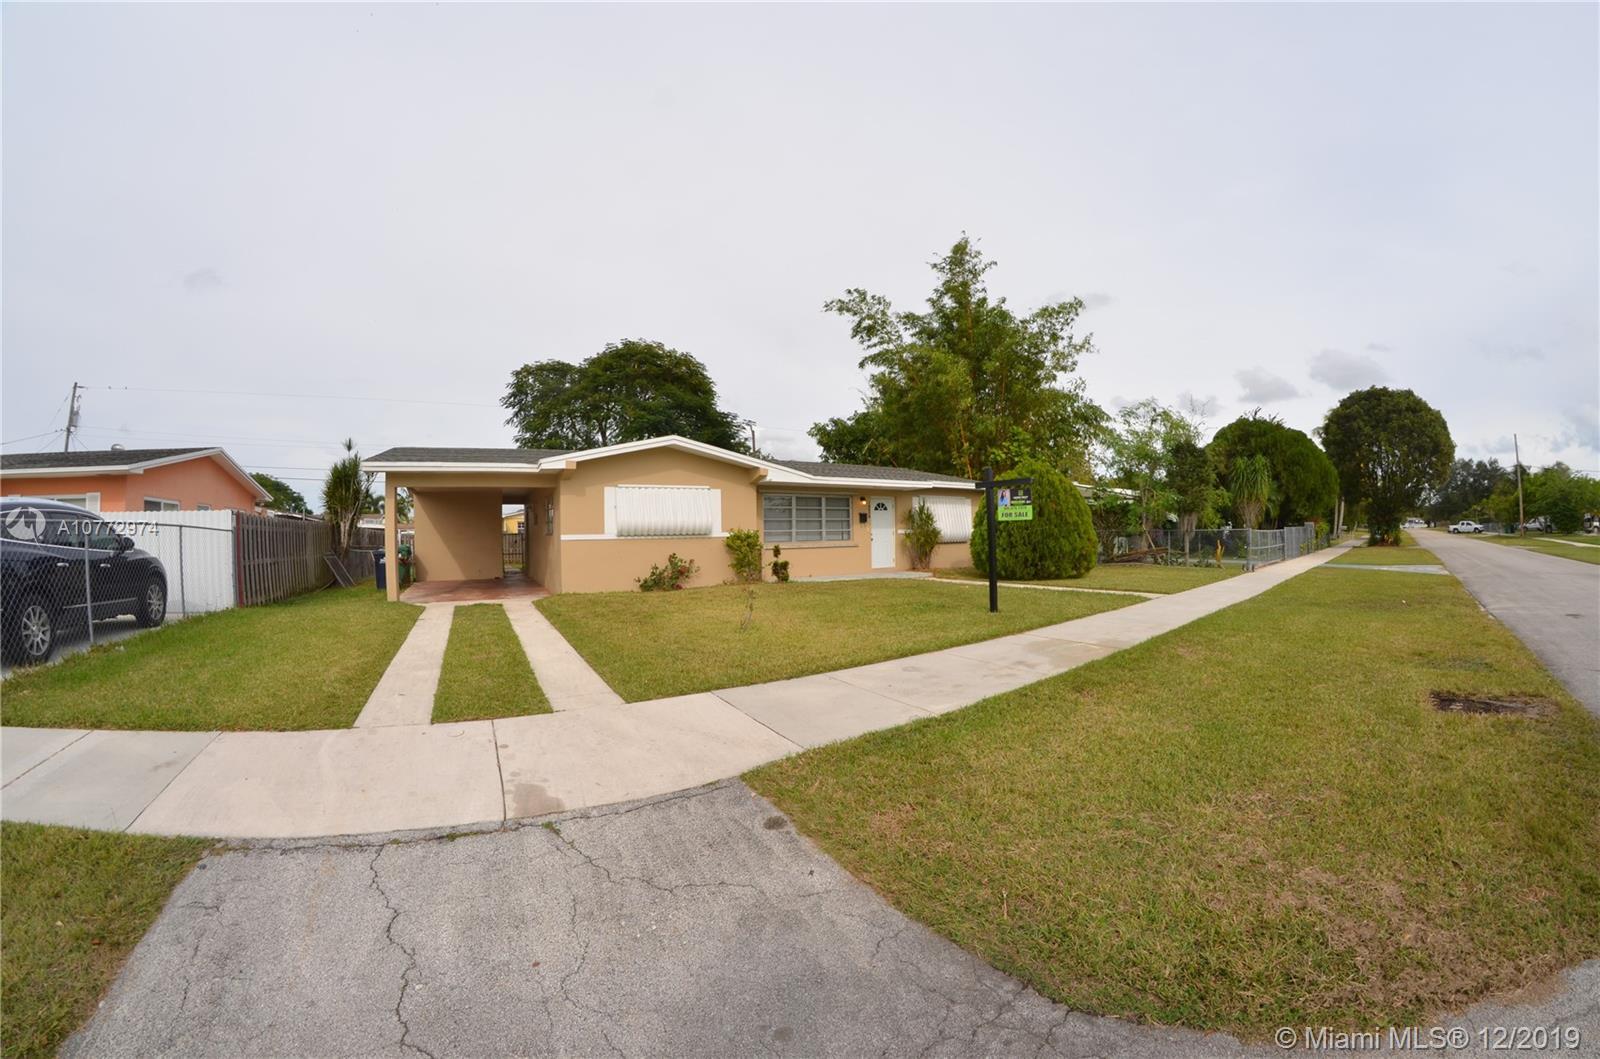 14525 SW 286th St, Homestead, FL 33033 - Homestead, FL real estate listing